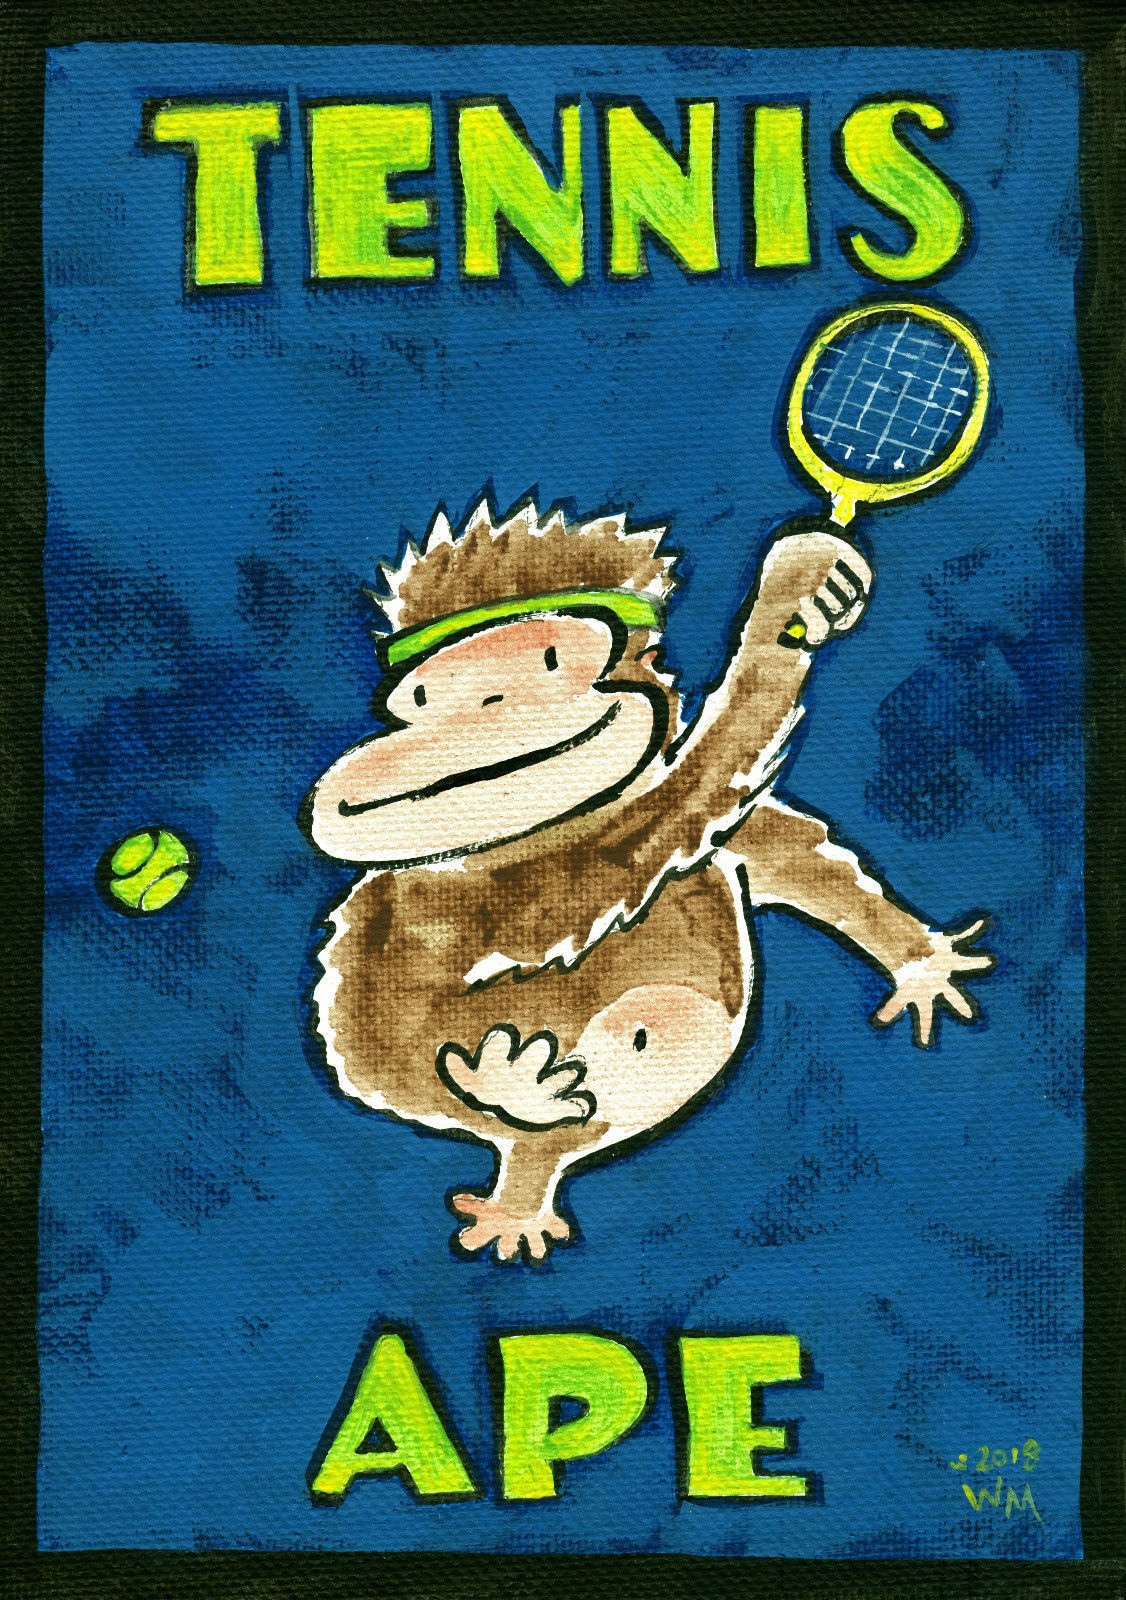 "Tennis Ape, Original Painting by Walter Moore 5 x 7"" (12.7 x 17.7 cm)"